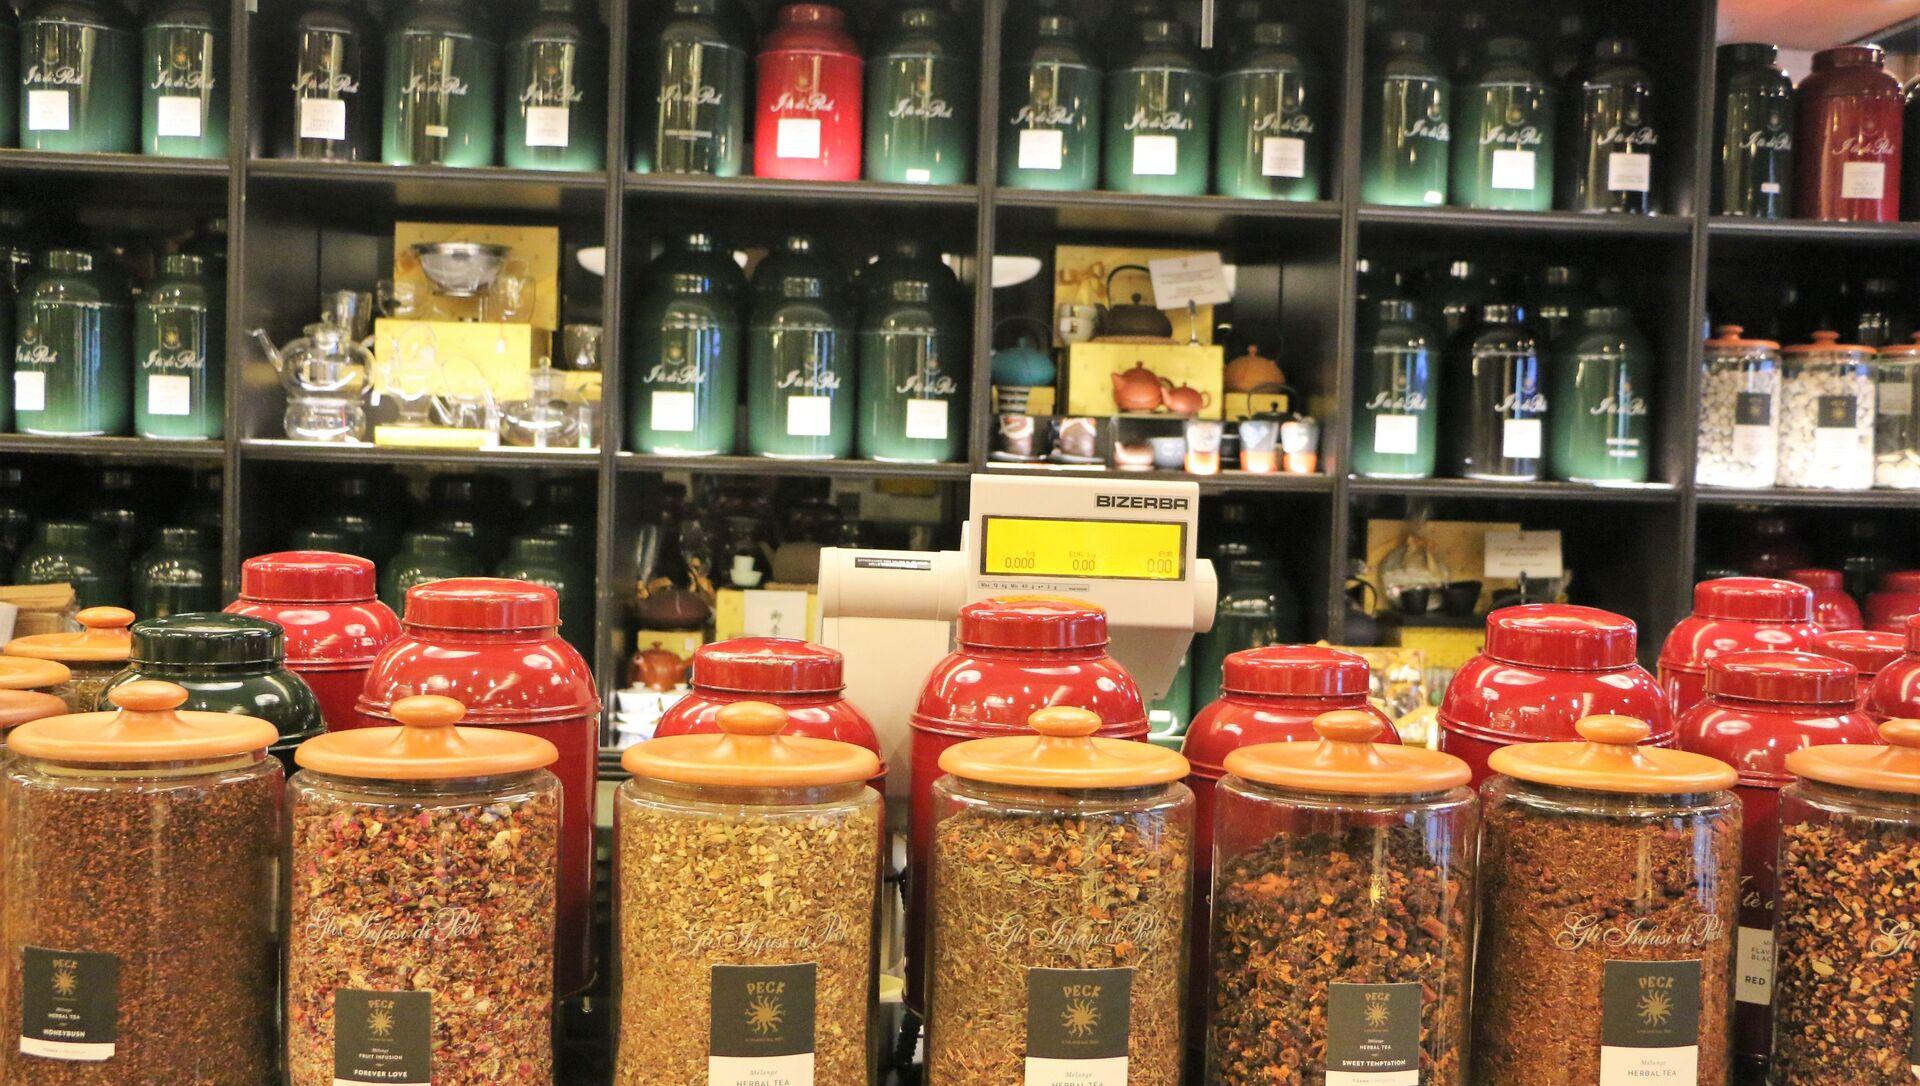 Un negozio di tè - Sputnik Italia, 1920, 28.04.2021